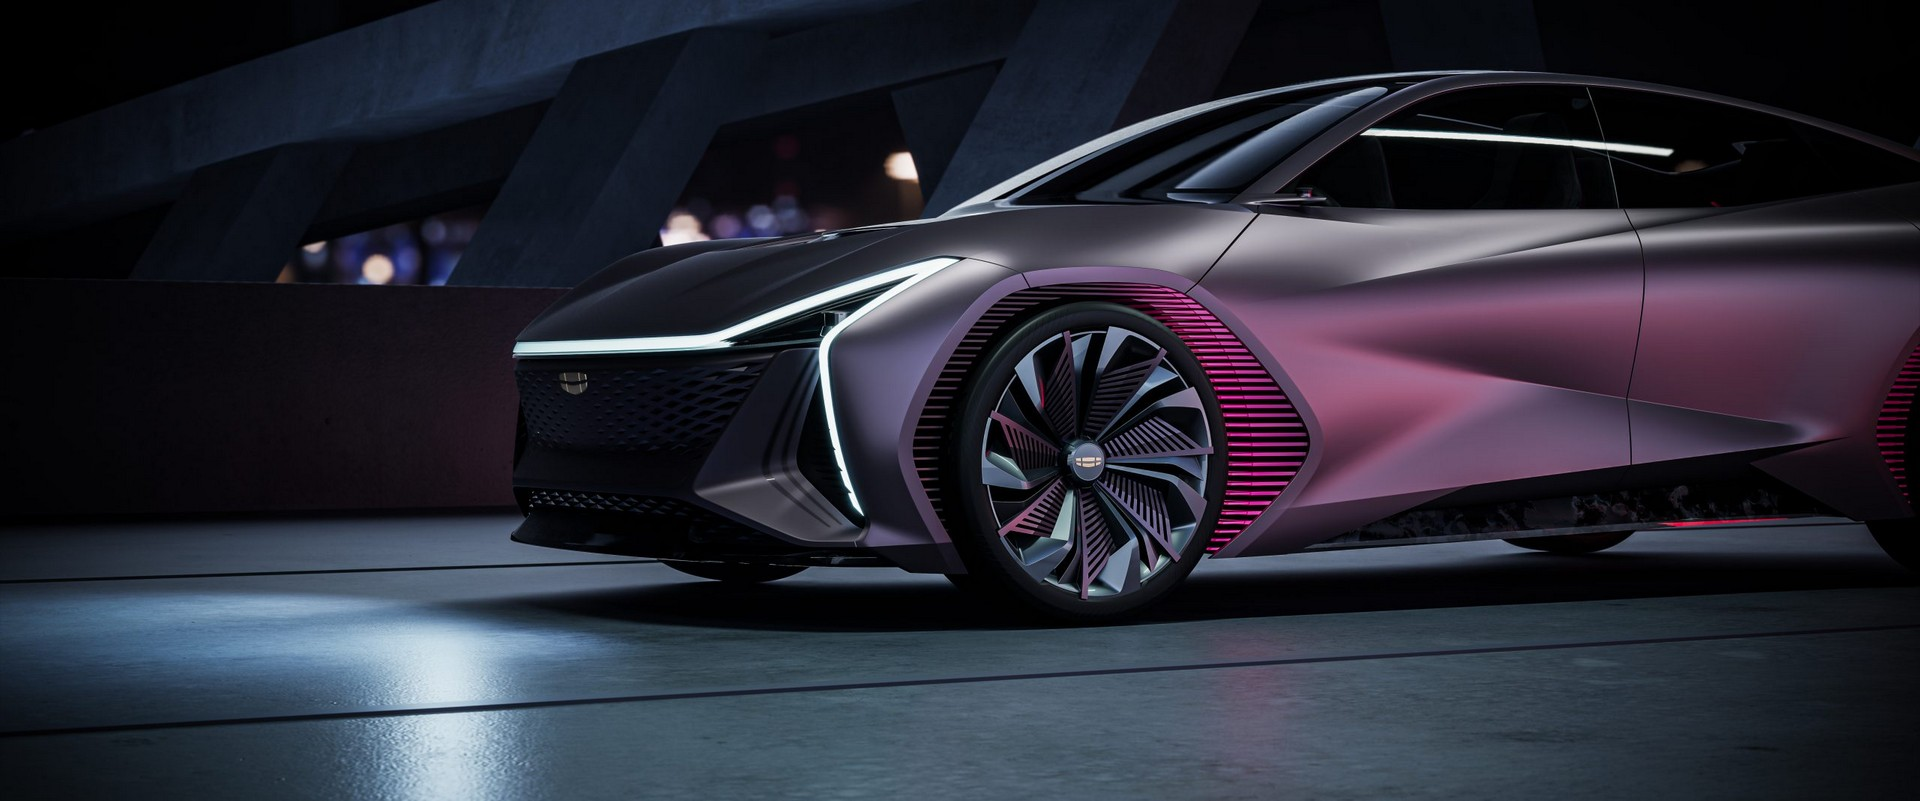 Geely-Vision-Starburst-concept-8